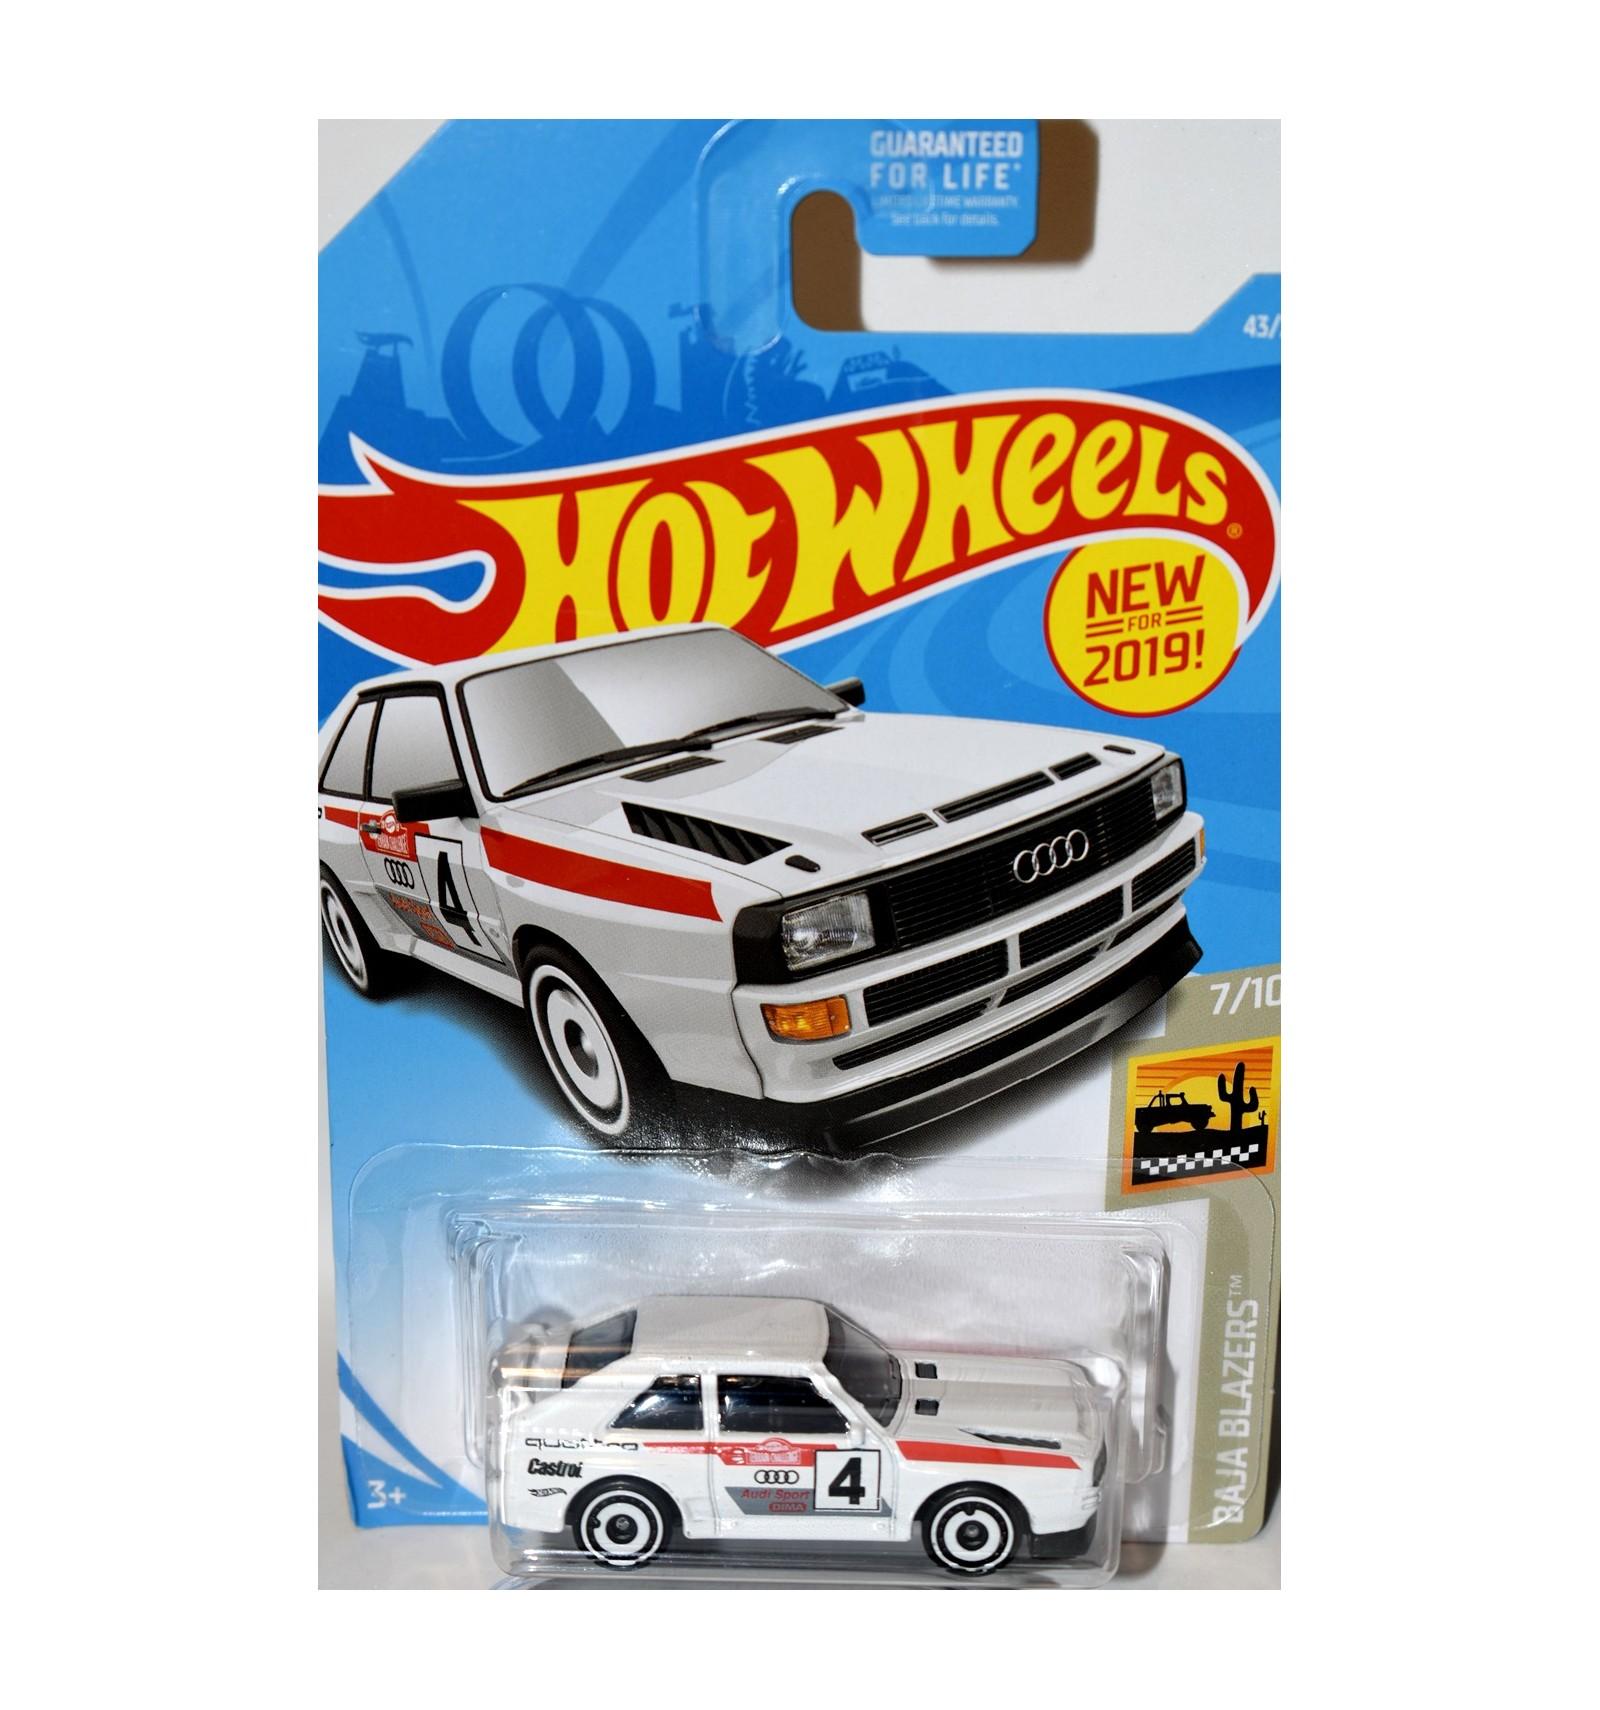 Hot Wheels 2019 New Models